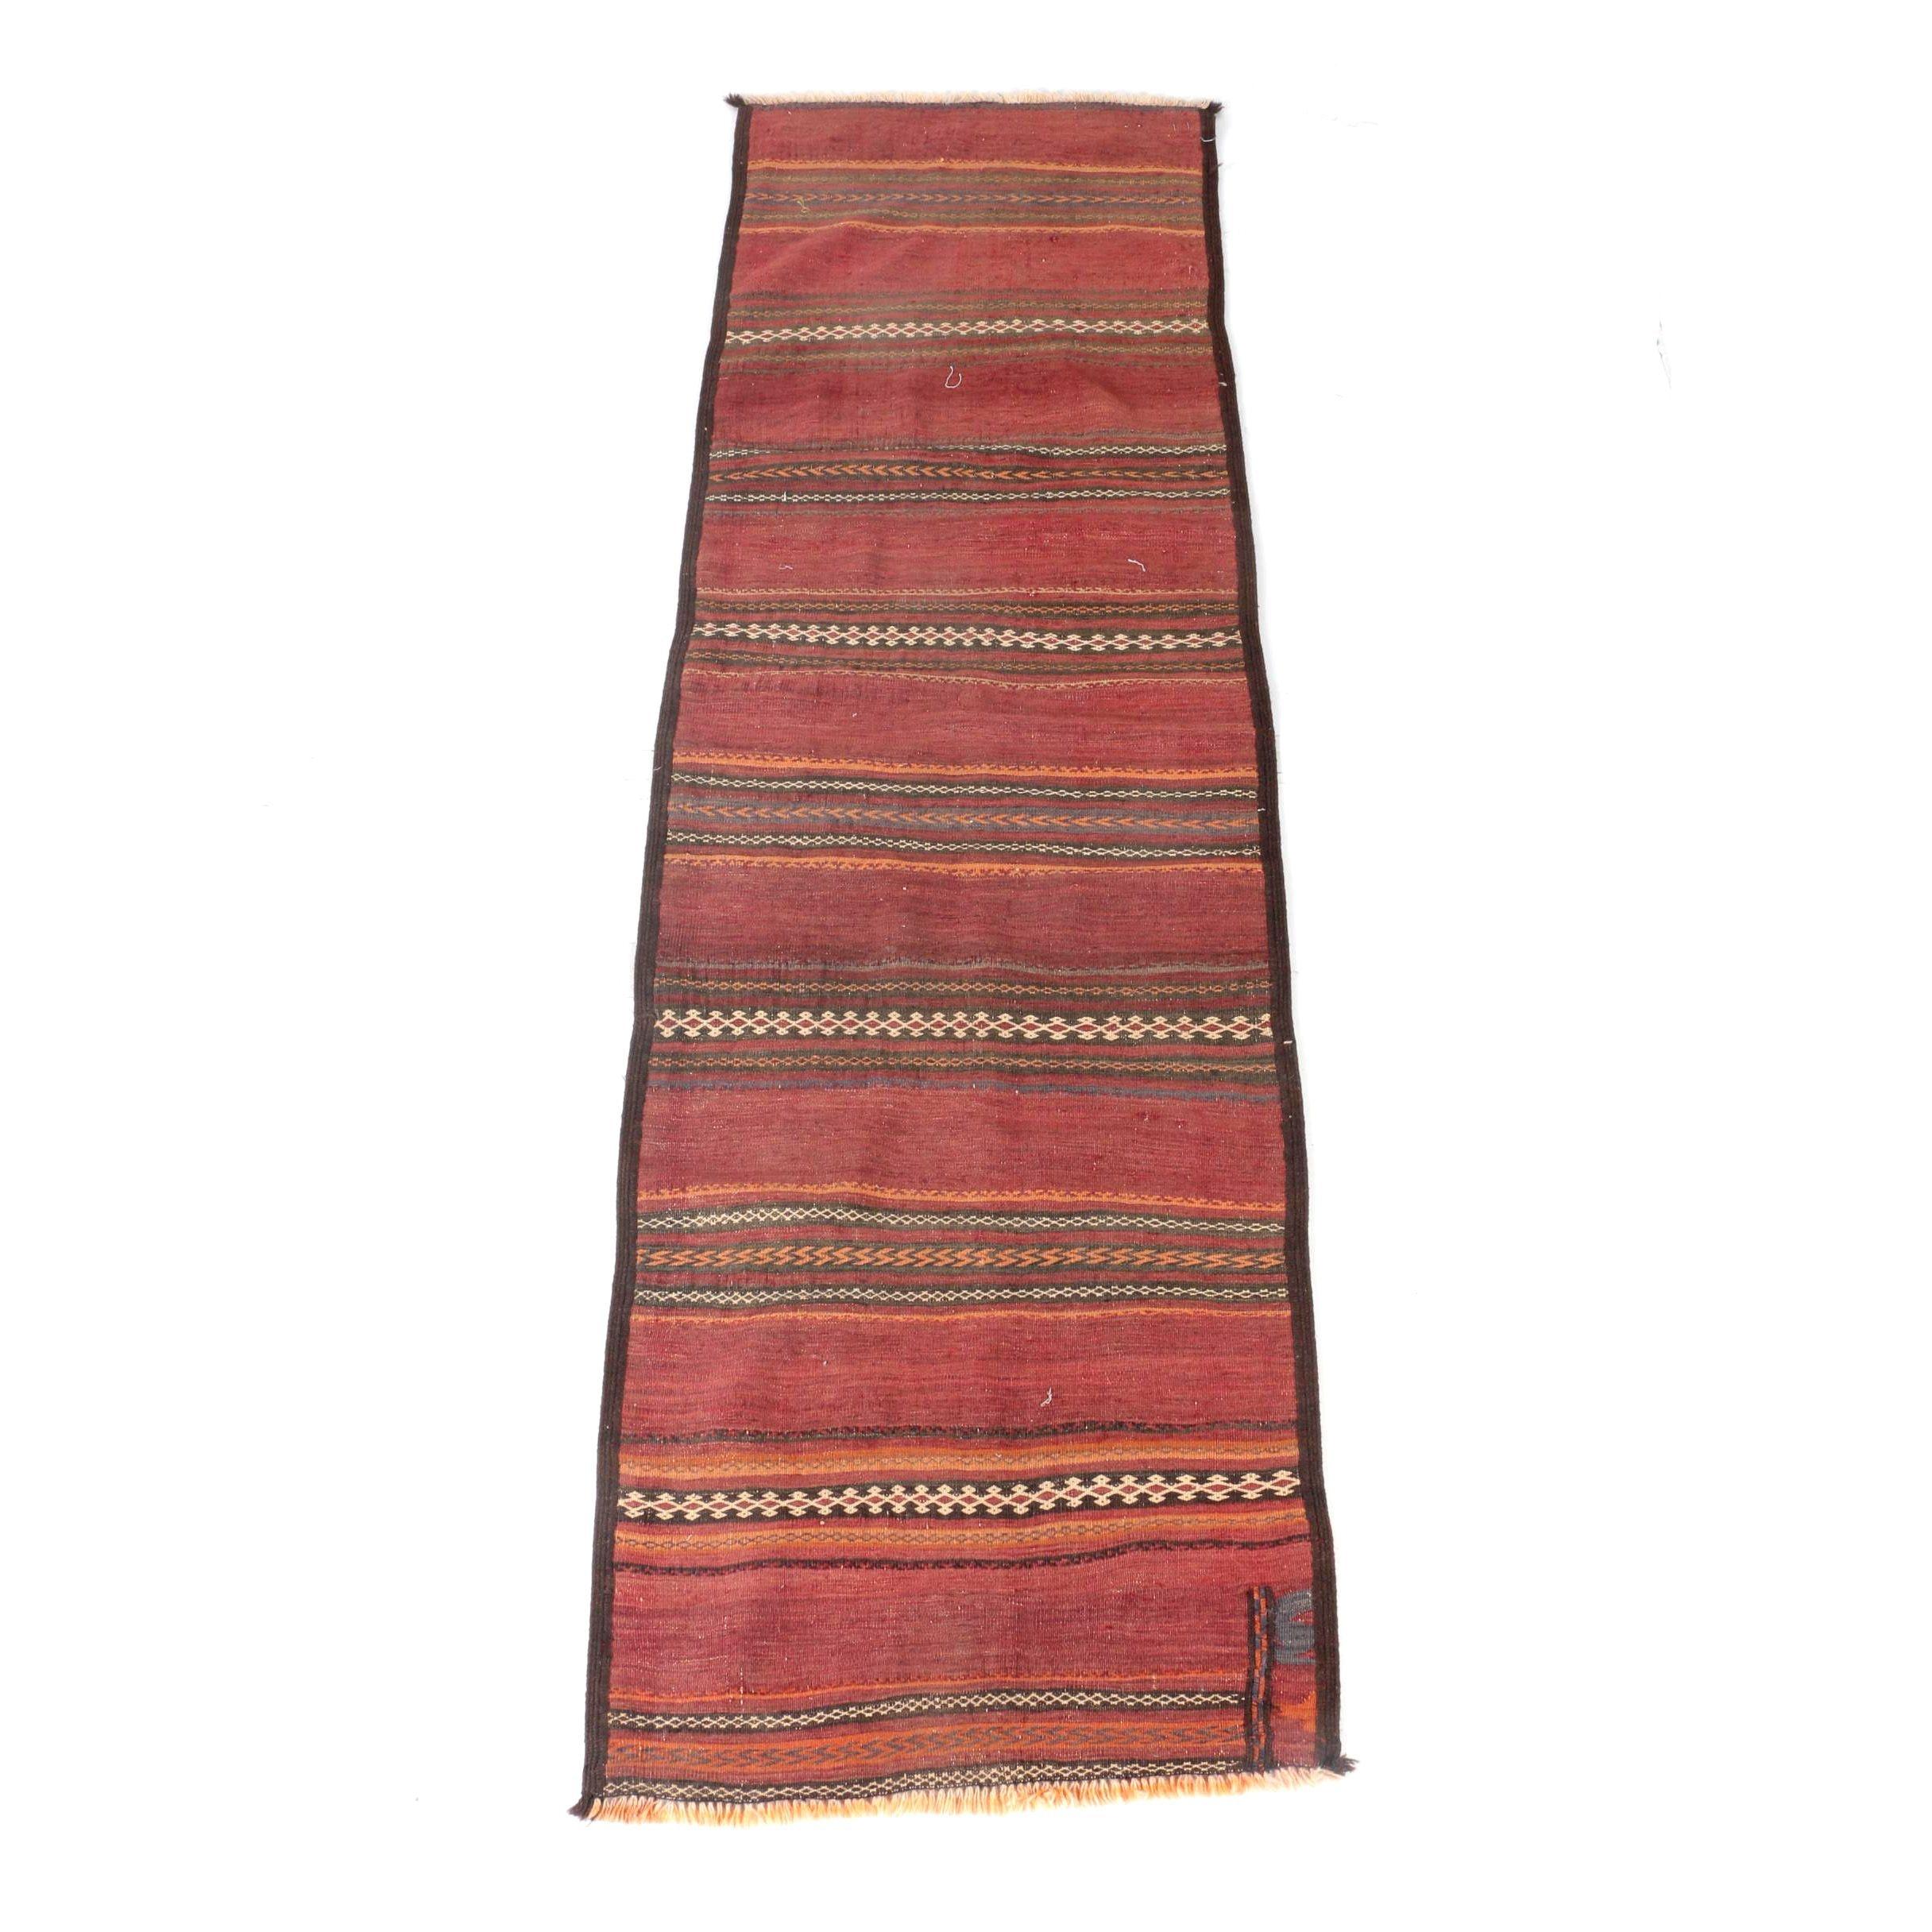 Handwoven Pakistani Carpet Runner